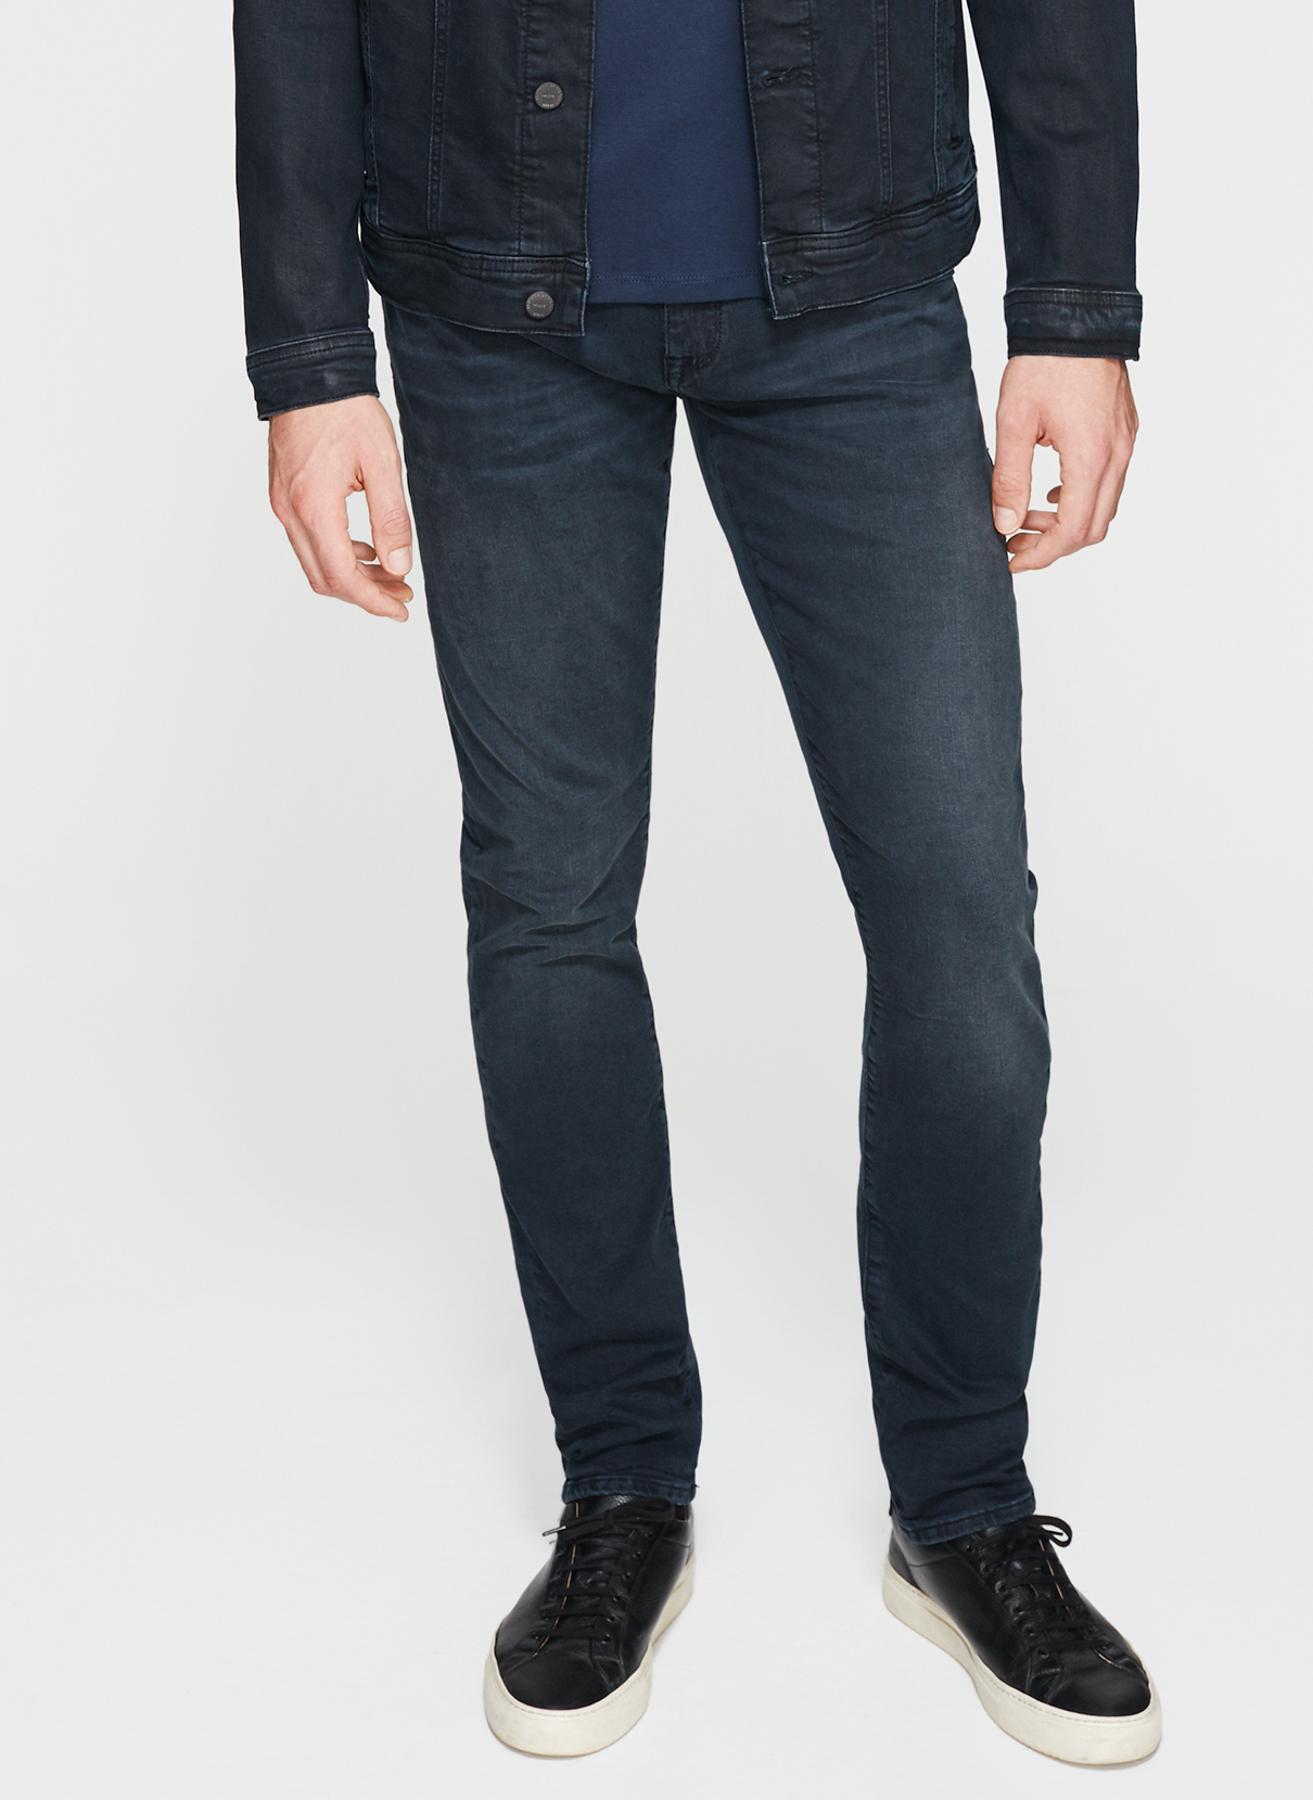 Mavi Klasik Pantolon 29-32 5001822951015 Ürün Resmi